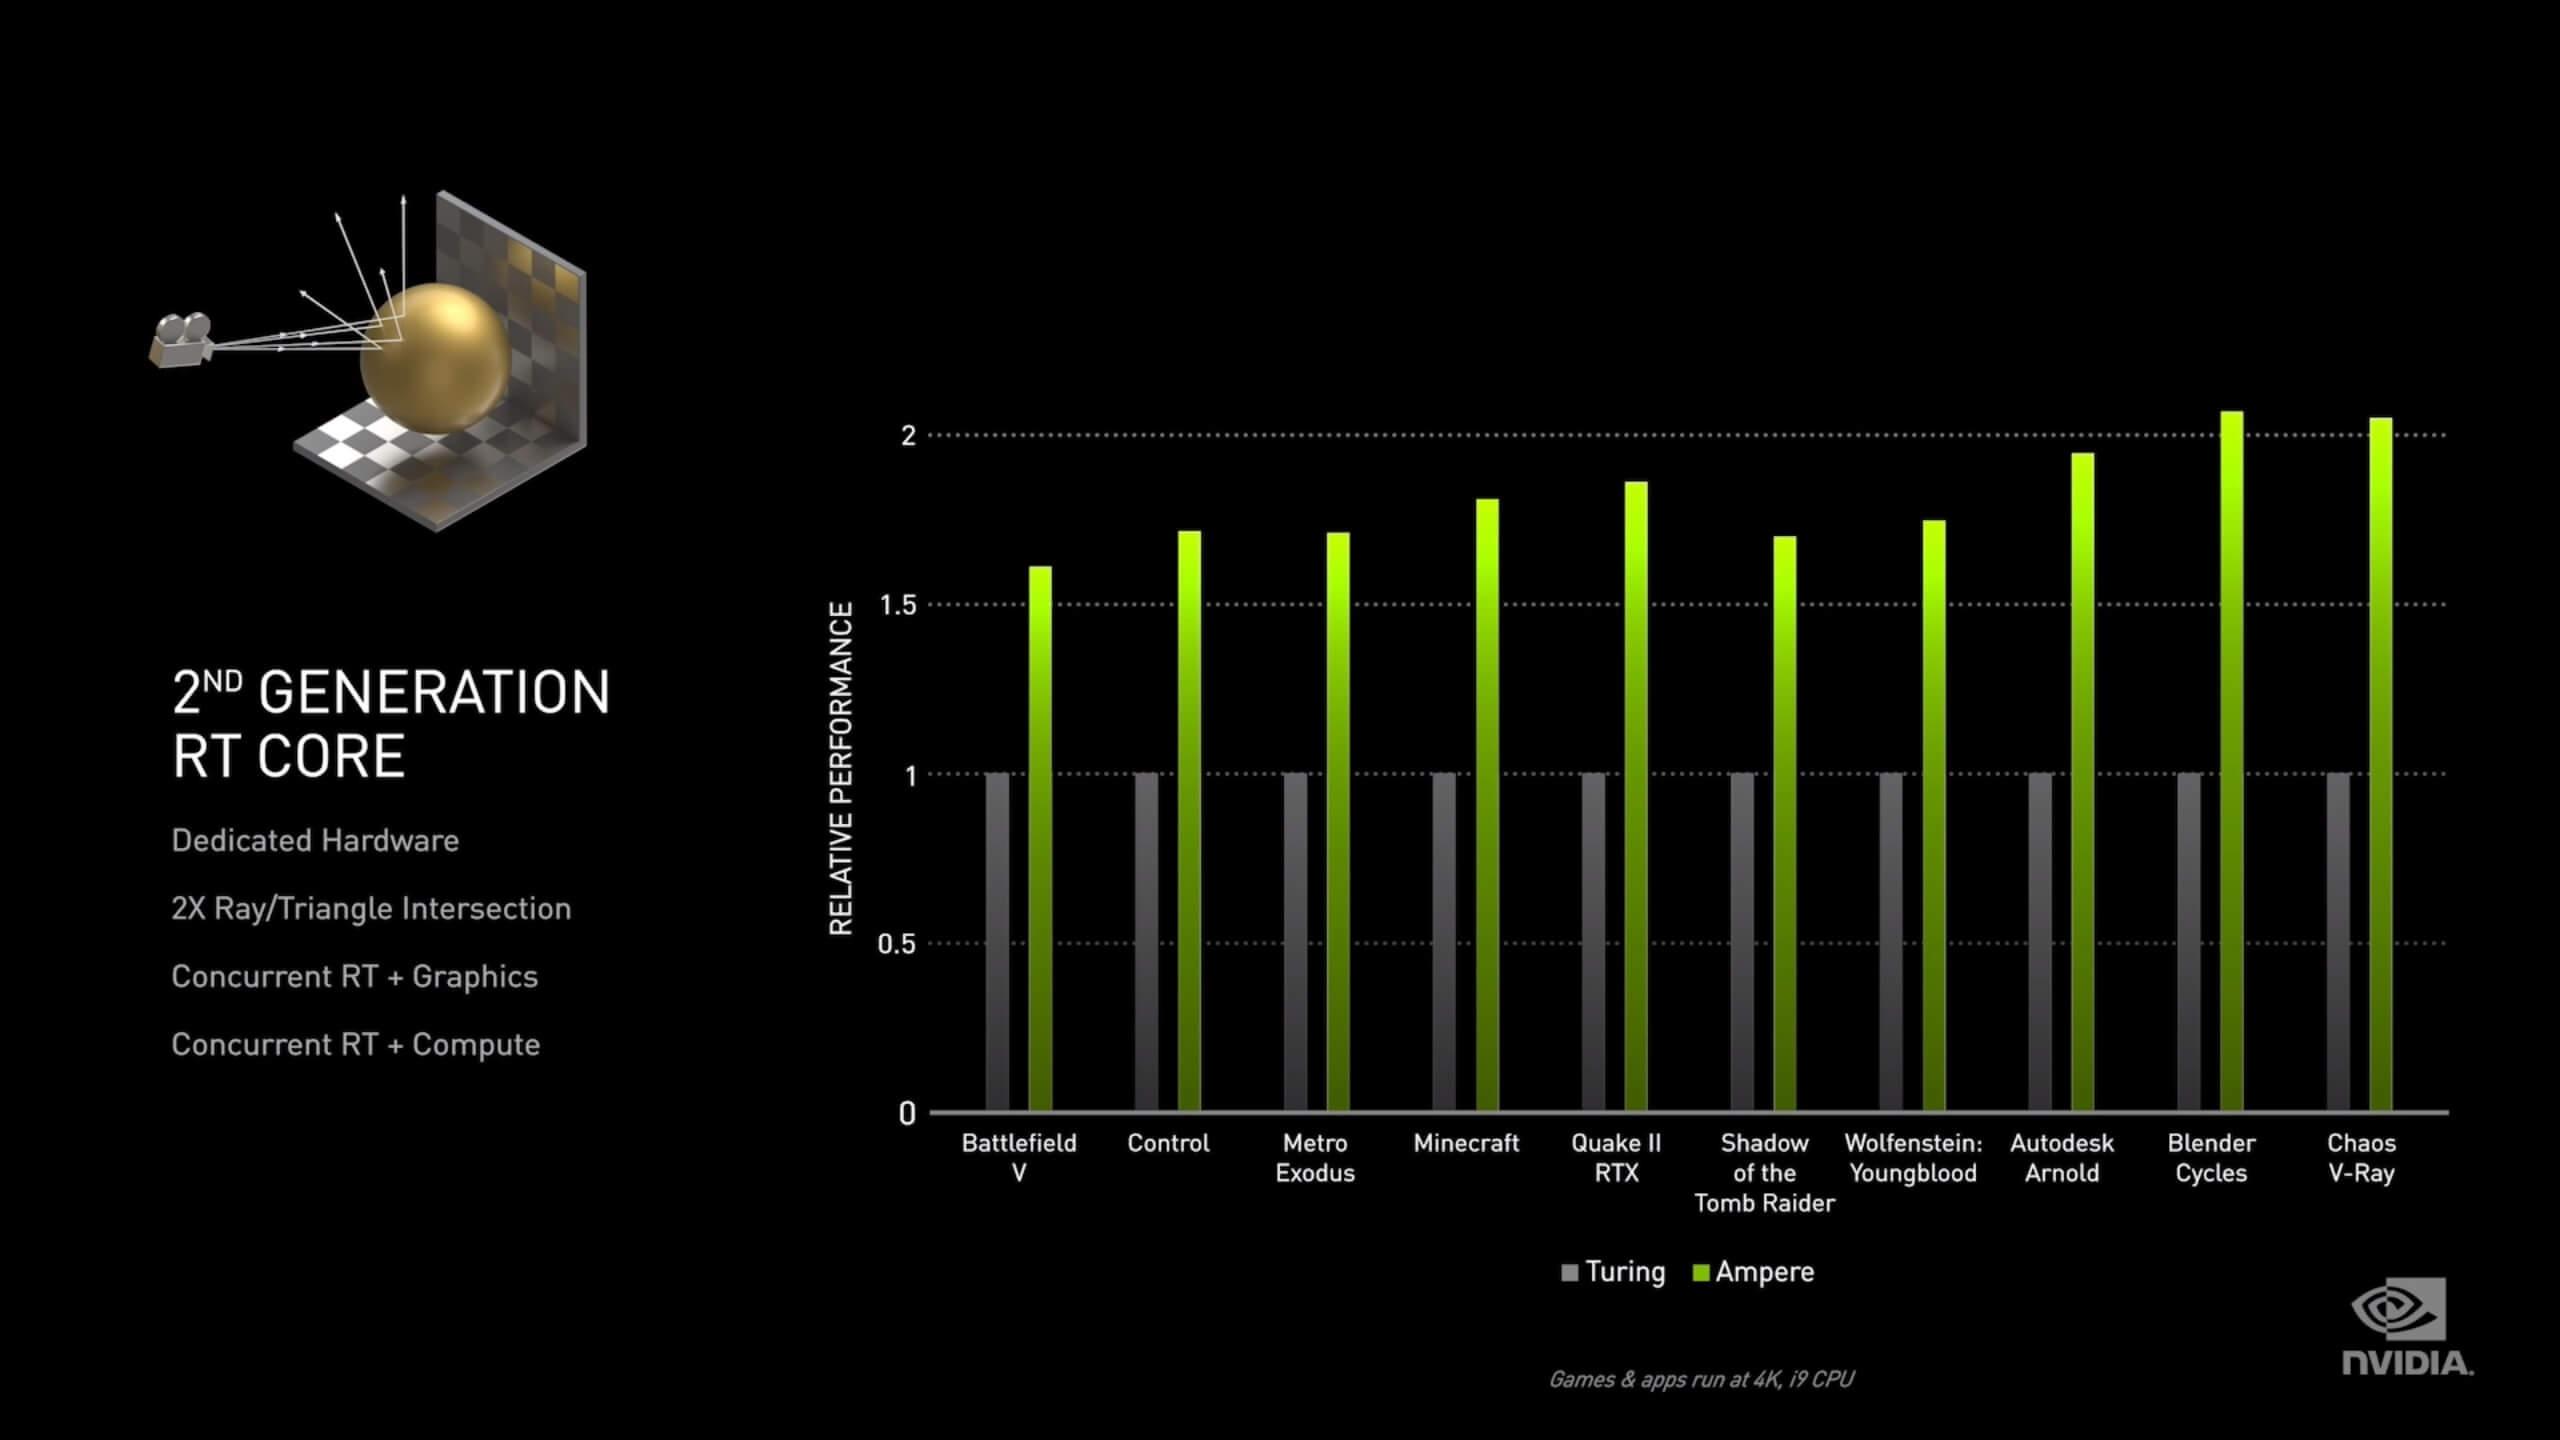 Ampere vs Turing performance